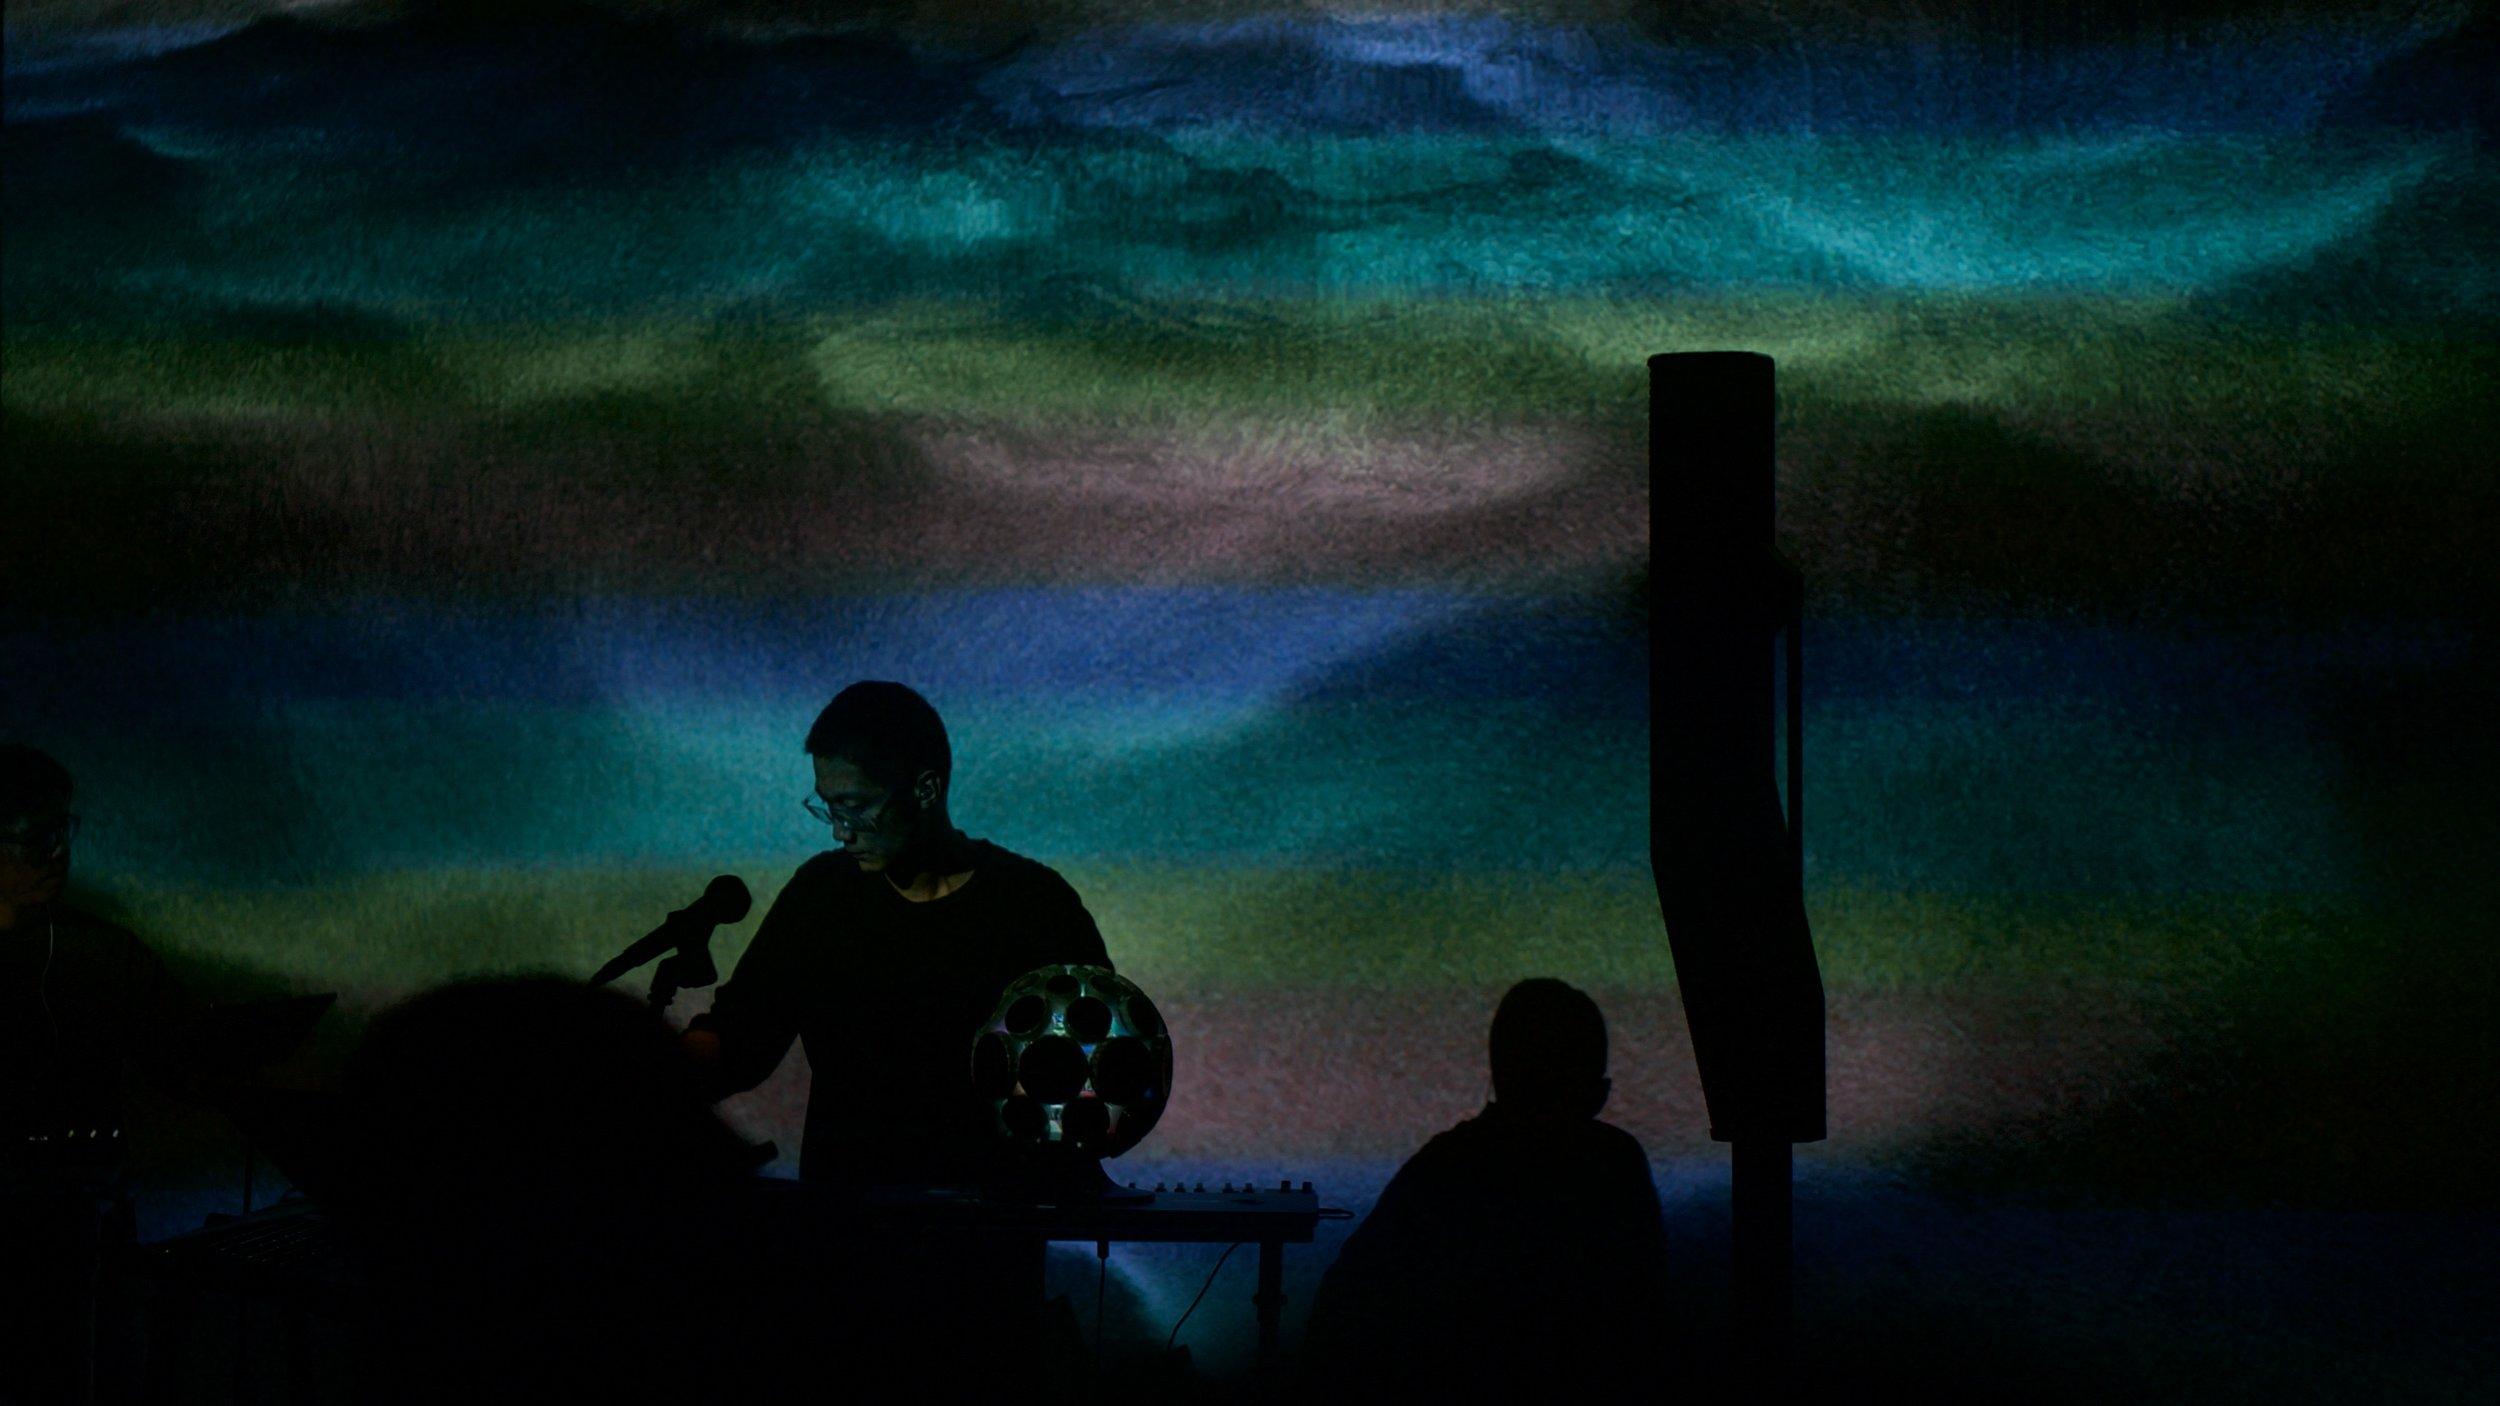 "Jason Hou是一名来自北京的音乐制作人、其作品在多样化声音元素与多变的情绪交融的同时保持着稳固的连续性与鲜明的个人风格。  Jason作为京城厂牌 Do Hits 的一员活跃于音乐场景中。他是知名的 AlphaSphere 演奏者 (阿尔法球,创意MIDI控制器,由英国人Adam Place发明),2016年受邀在德国慕尼黑的BMW总部表演,2018年初参加德国的CTM音乐节,在柏林著名俱乐部Berghain演出。  Jason在Do Hits发表全长专辑 《生》 、EP 《原》 ; 在新乐府发表与京剧艺术家谭正岩合作的 ""定军山"" 与 ""空城计"" 选段remix; 在Muti Music发表为ill.Gates制作的 ""More Tea""  remix;在Outallectuals发表与民族音乐唱作人Yider合作的 ""Foreign Land"" 。Jason为阿朵2017年新专辑《死里复活》中 ""起初"" 与 ""那里是哪里"" 两首歌编曲。他的guest mix曾在Rinse FM及Radar Radio播出。他的作品也获得了Jojo Mayer, 厂牌Mad Decent及Boiler Room的推荐。2018年Jason的作品收录于德国音乐科技公司Native Instruments的第二期 Native Sketches音乐随笔 项目。  Jason与 Hibanana工作室 的视觉艺术家苗晶合作声音影像装置作品 ""渐"" [Transition] 。作品曾在重庆Apple Store、美国新墨西哥州Currents新媒体艺术节及芭莎150周年""破.界""艺术巡展 (于北京今日美术馆、成都红美术馆、上海MoCa当代艺术博物馆)中参展。  Jason也是 第二感音频科技  (2nd Sense Audio) 的创始成员之一,参与了合成器软件 WIGGLE 的研发,软件推出后获得了Computer Music (电脑音乐)杂志颁发的年度创新与表现奖。  目前 Jason 专注于声音影像现场表演项目  ""初 · ZPTPJ"" 。"